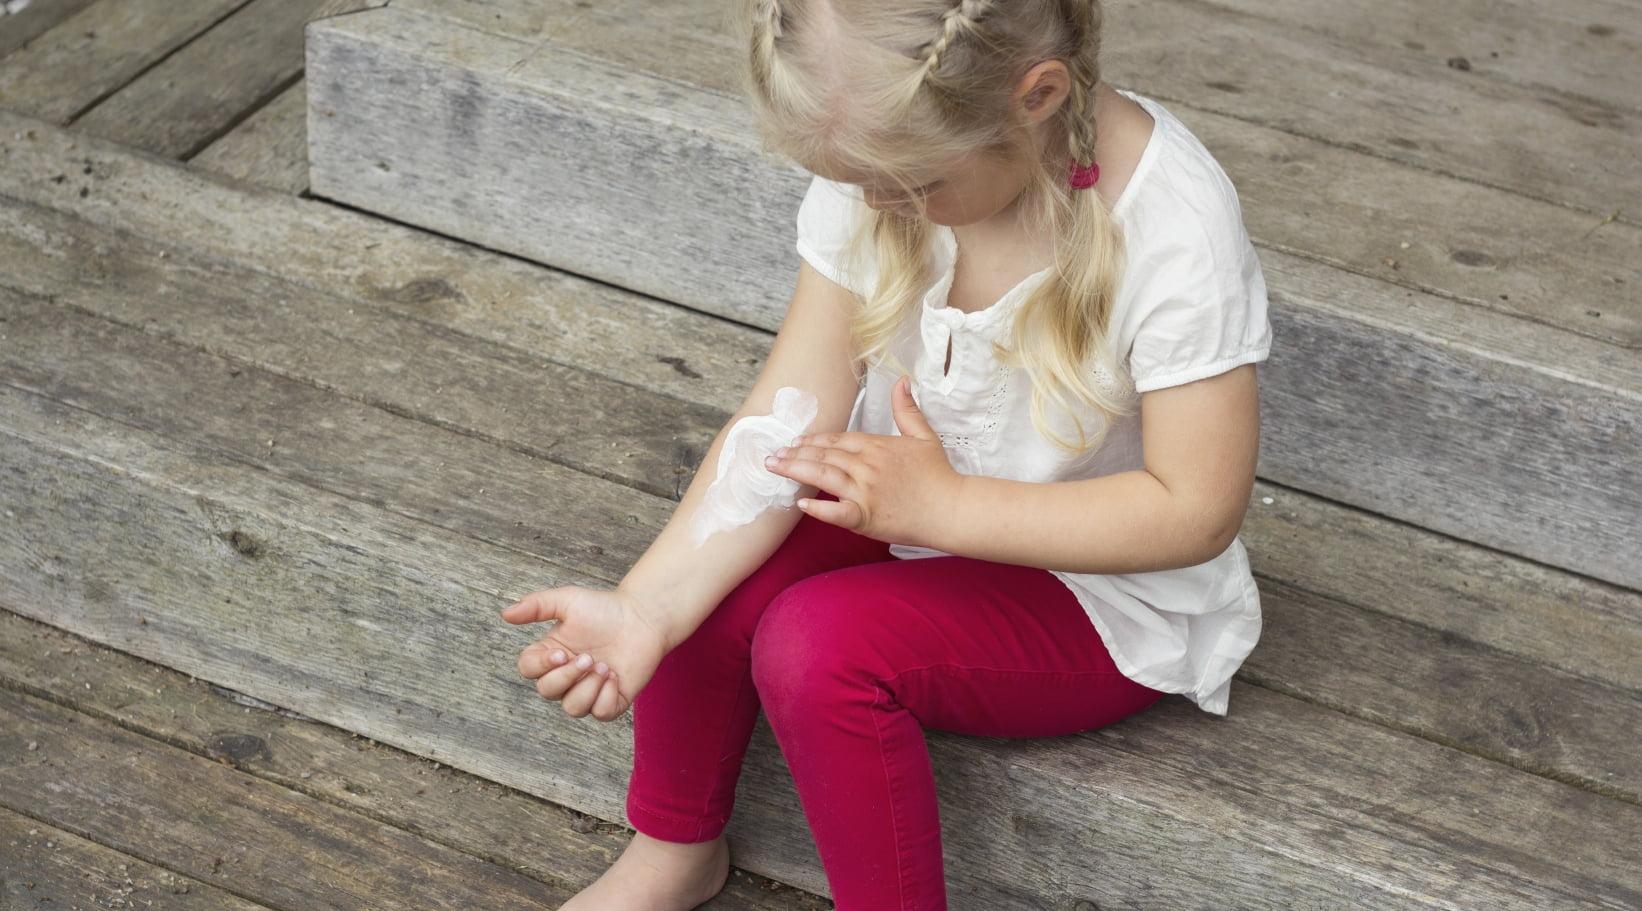 child applies cream to arm